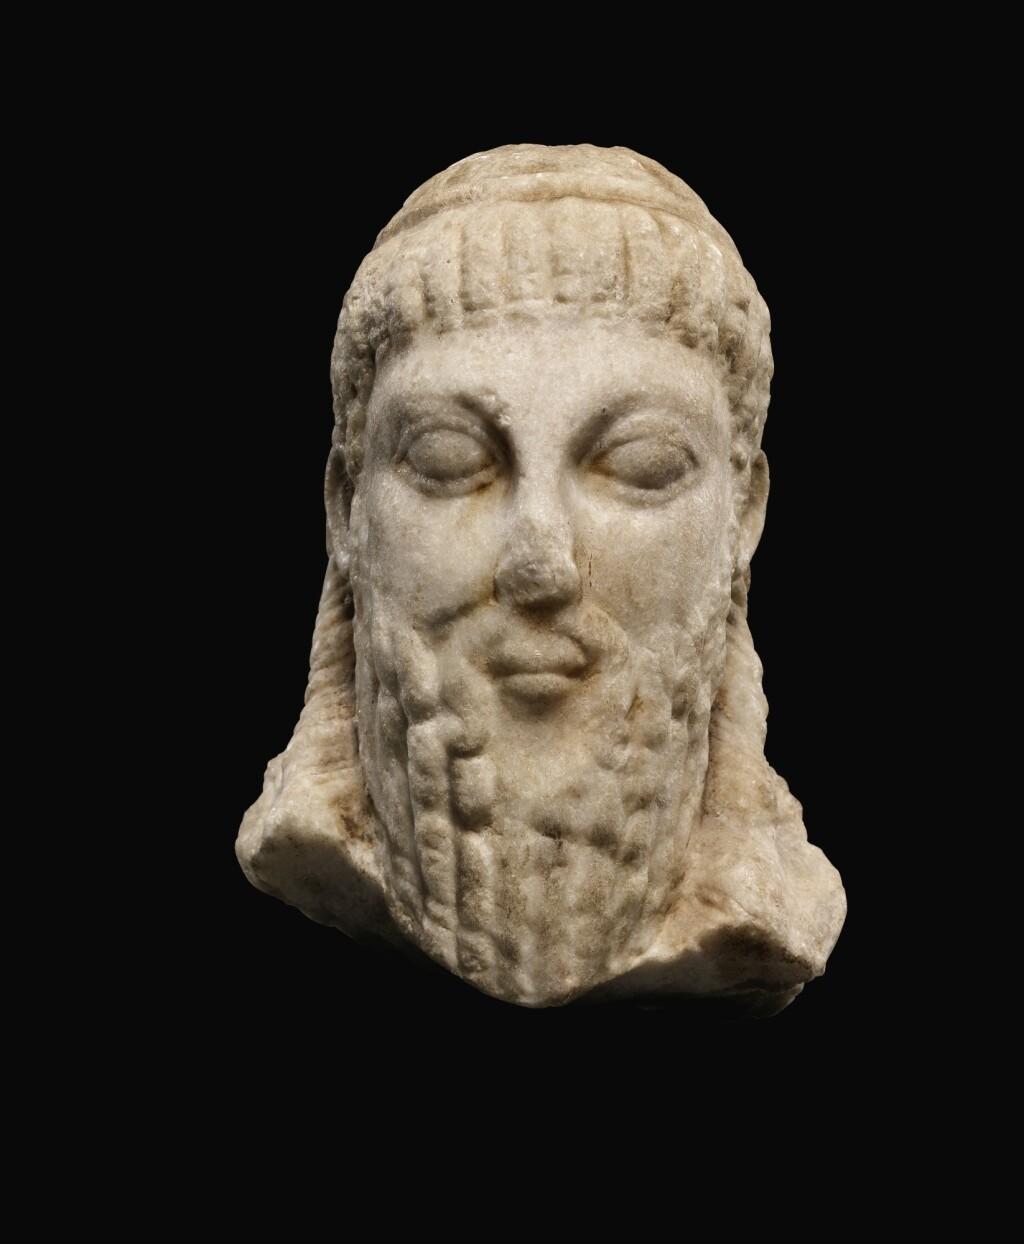 A ROMAN MARBLE ARCHAISTIC HERM HEAD OF DIONYSOS, CIRCA 2ND CENTURY A.D.